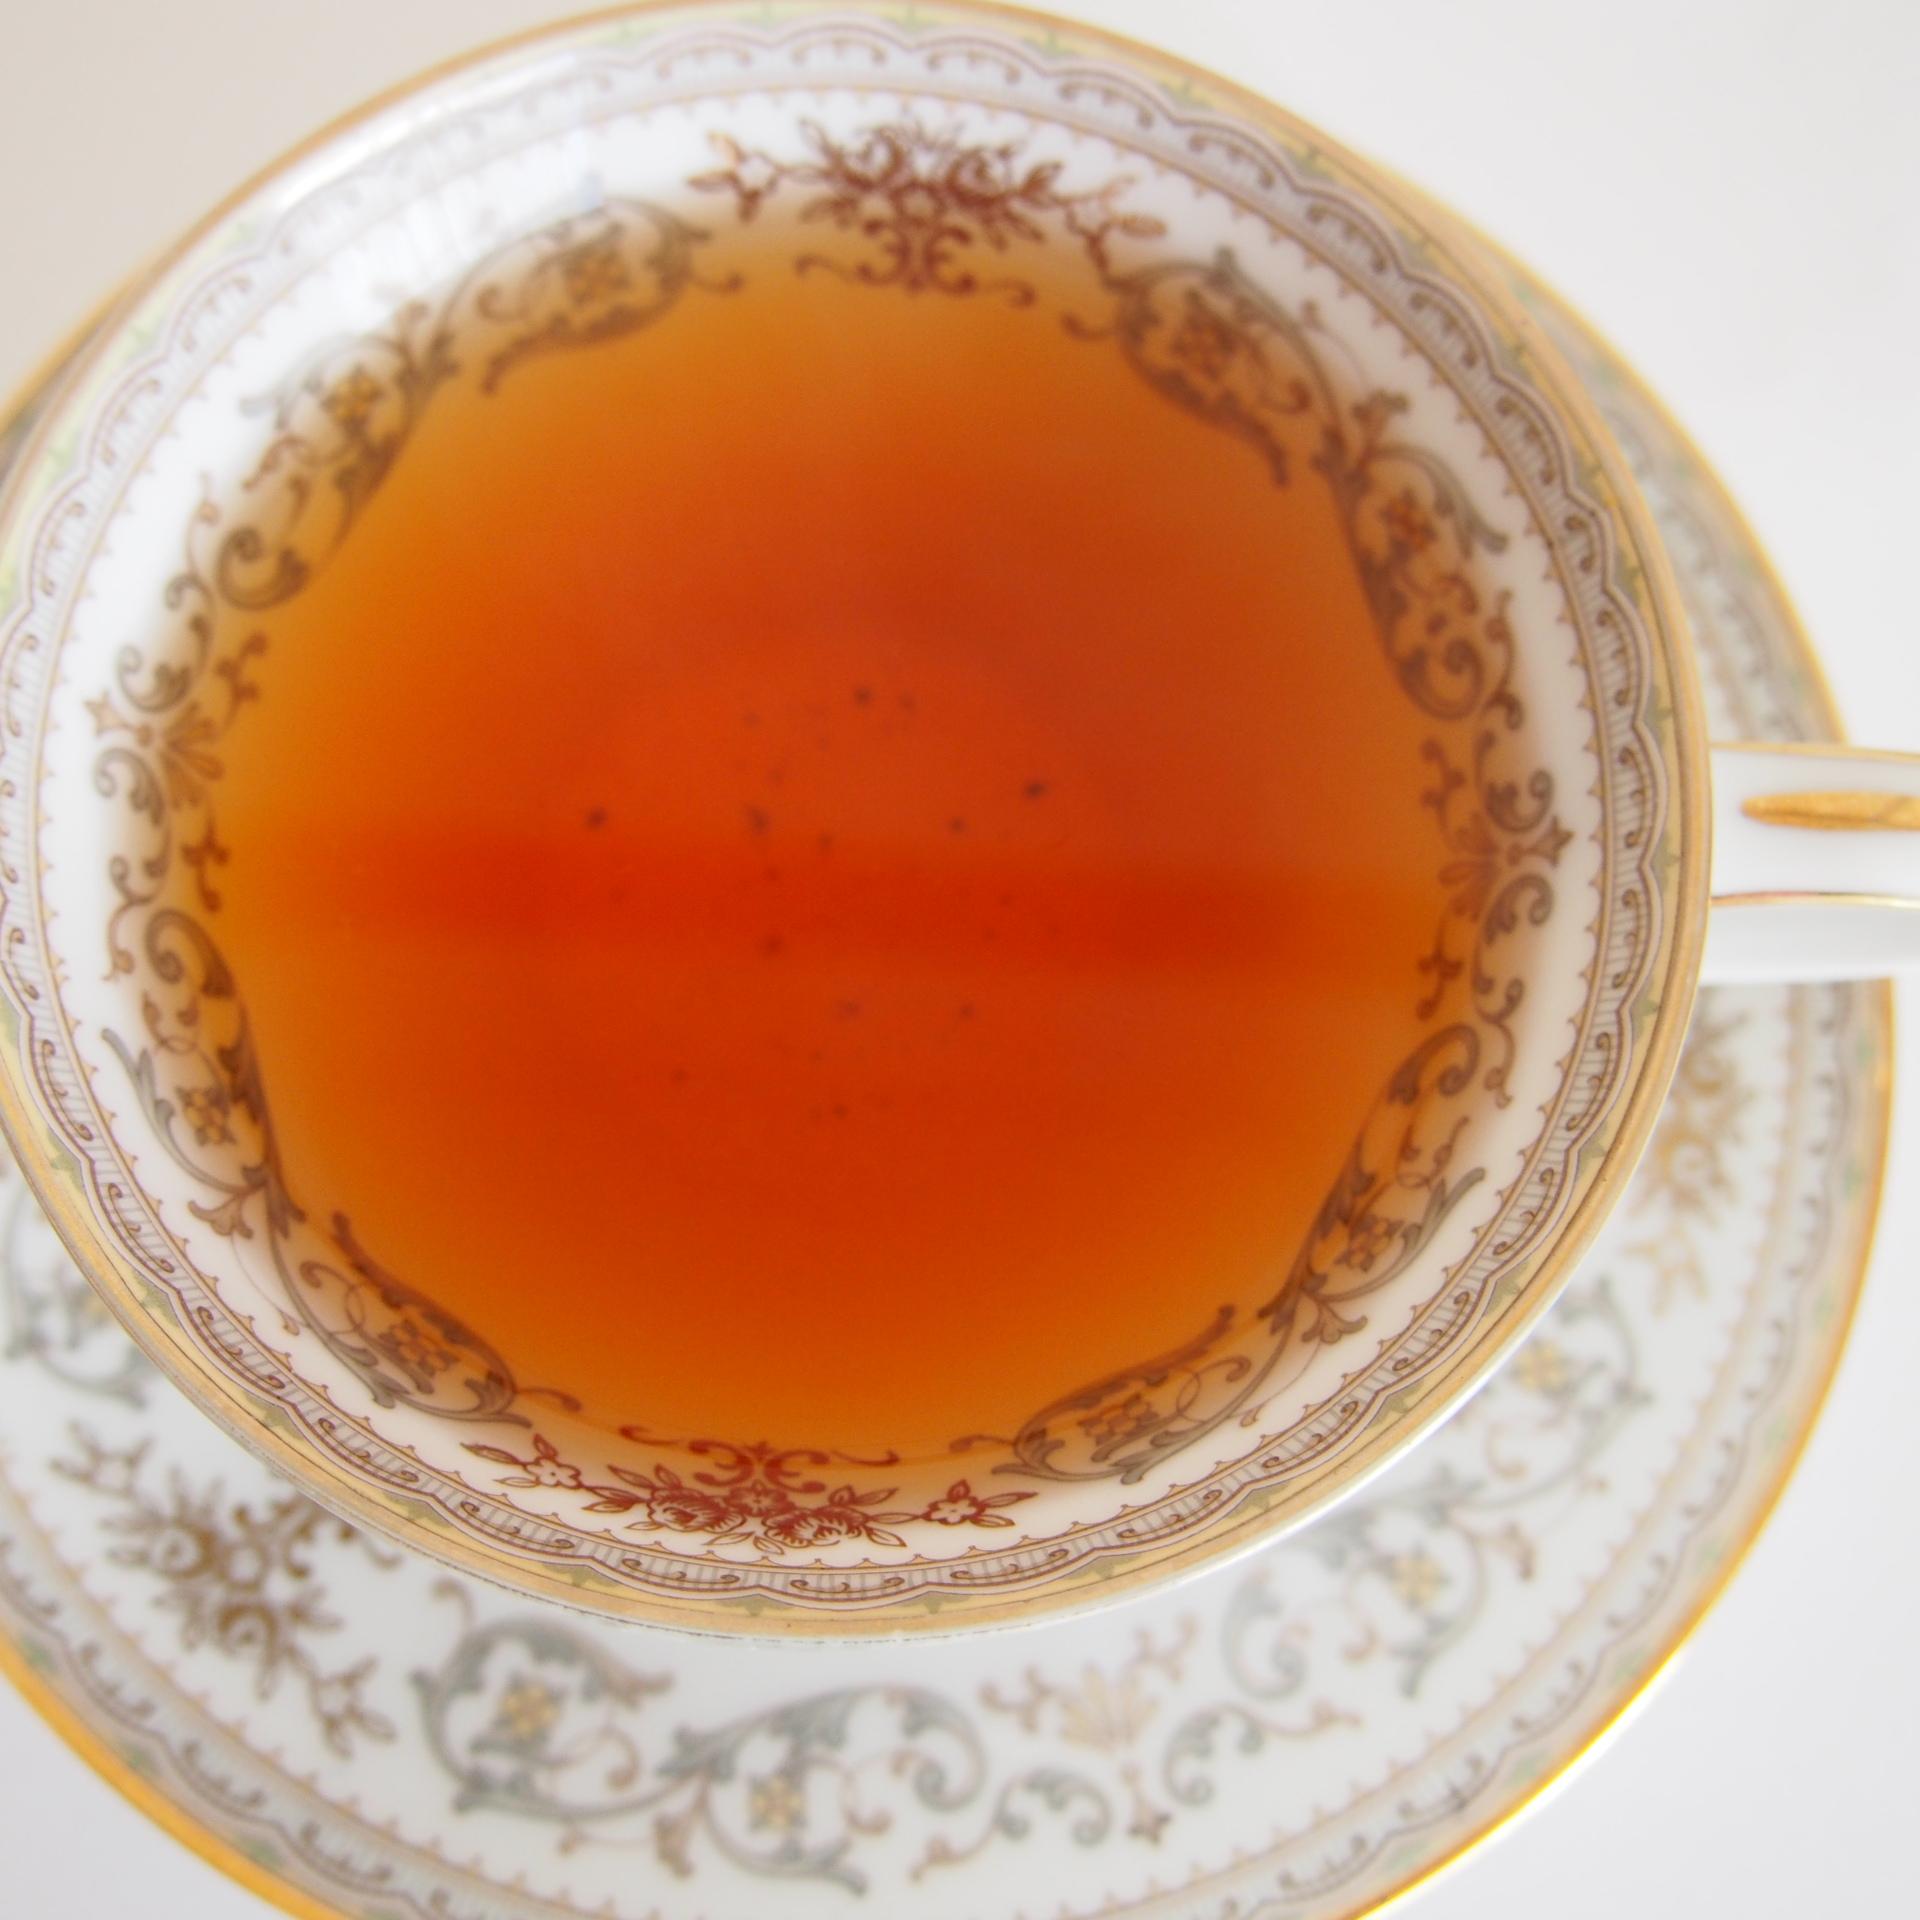 【DM便で送料無料・日時指定不可】2019年産シッキム紅茶(テミ茶園)2g×10個